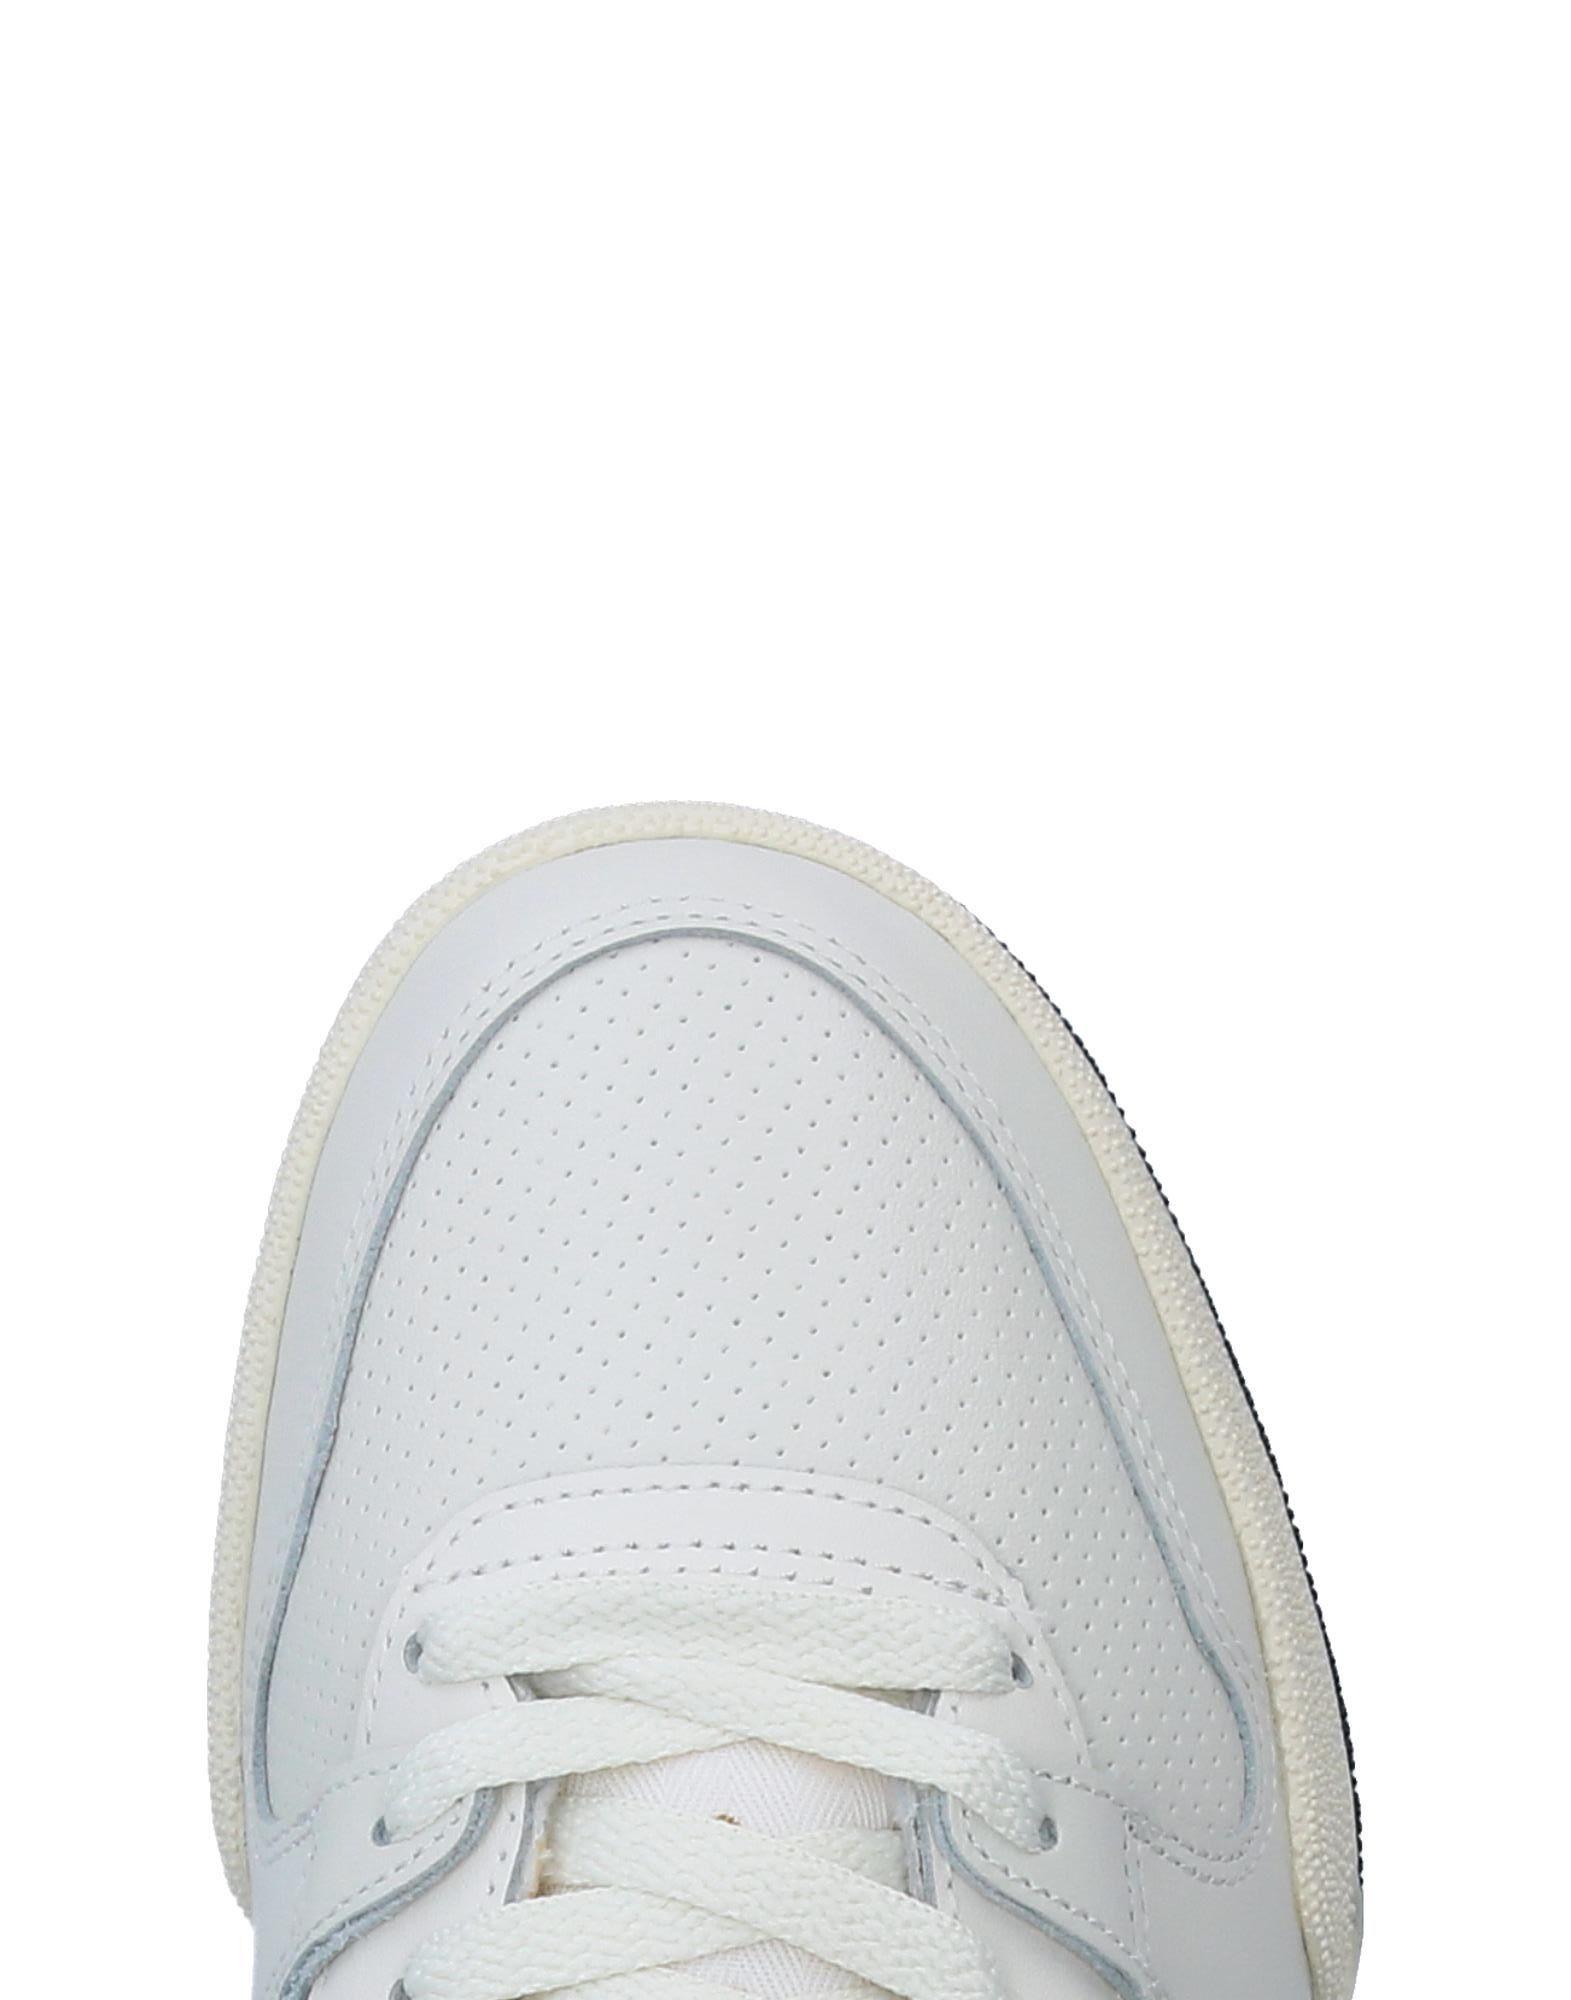 Rabatt echte  Schuhe Reebok Sneakers Herren  echte 11327447QN ff36e8